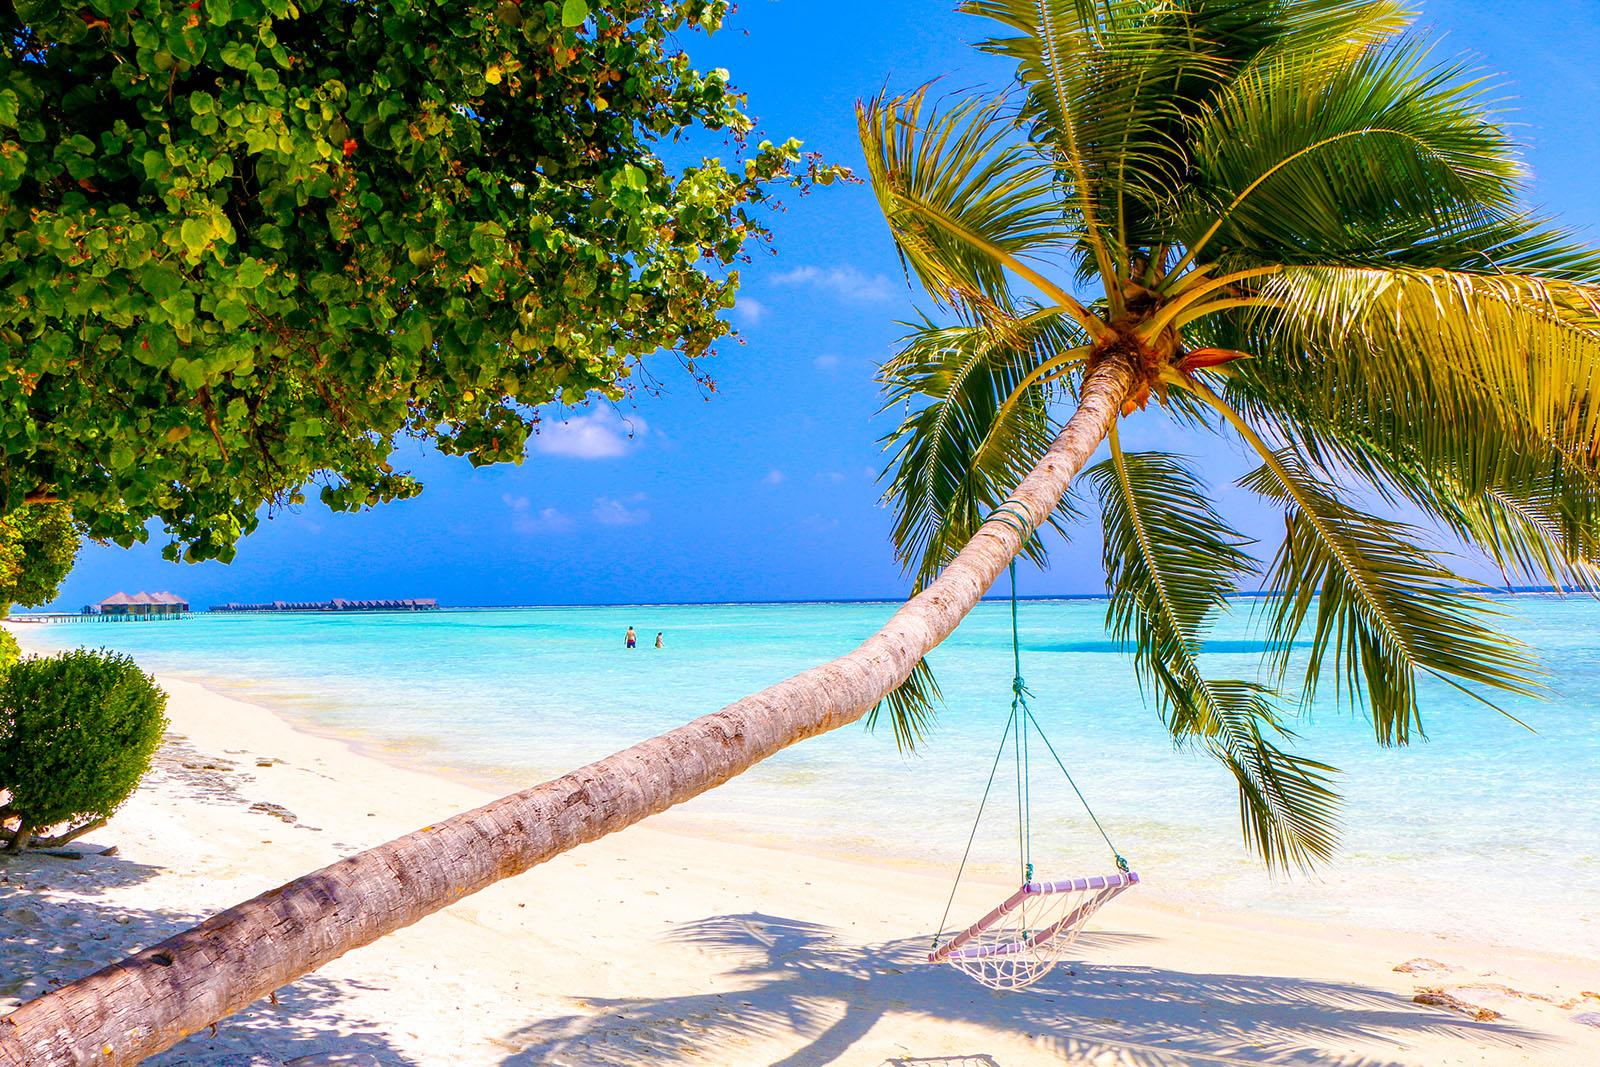 tur na maldivy juzhnyj male atoll 64 885 rub chel - Тур на Мальдивы Южный Мале Атолл 64 885 руб. чел.